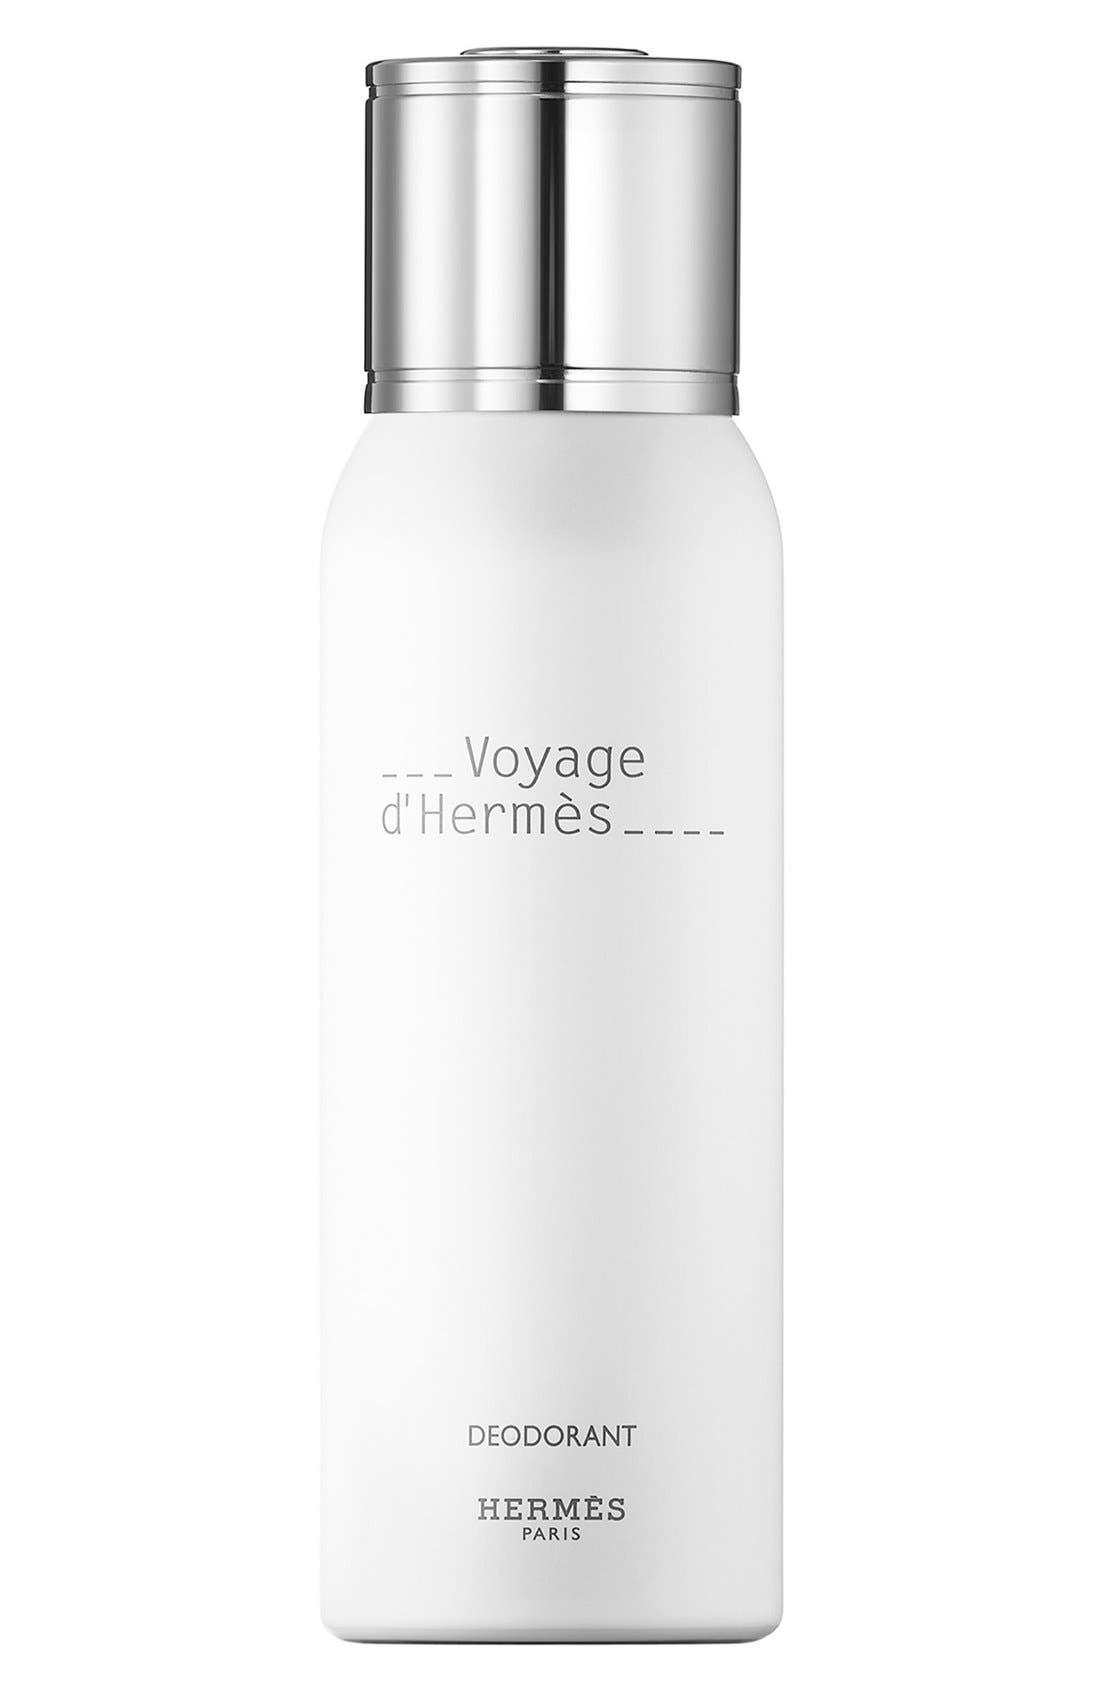 Hermès Voyage d'Hermès - Deodorant natural spray,                         Main,                         color, 000